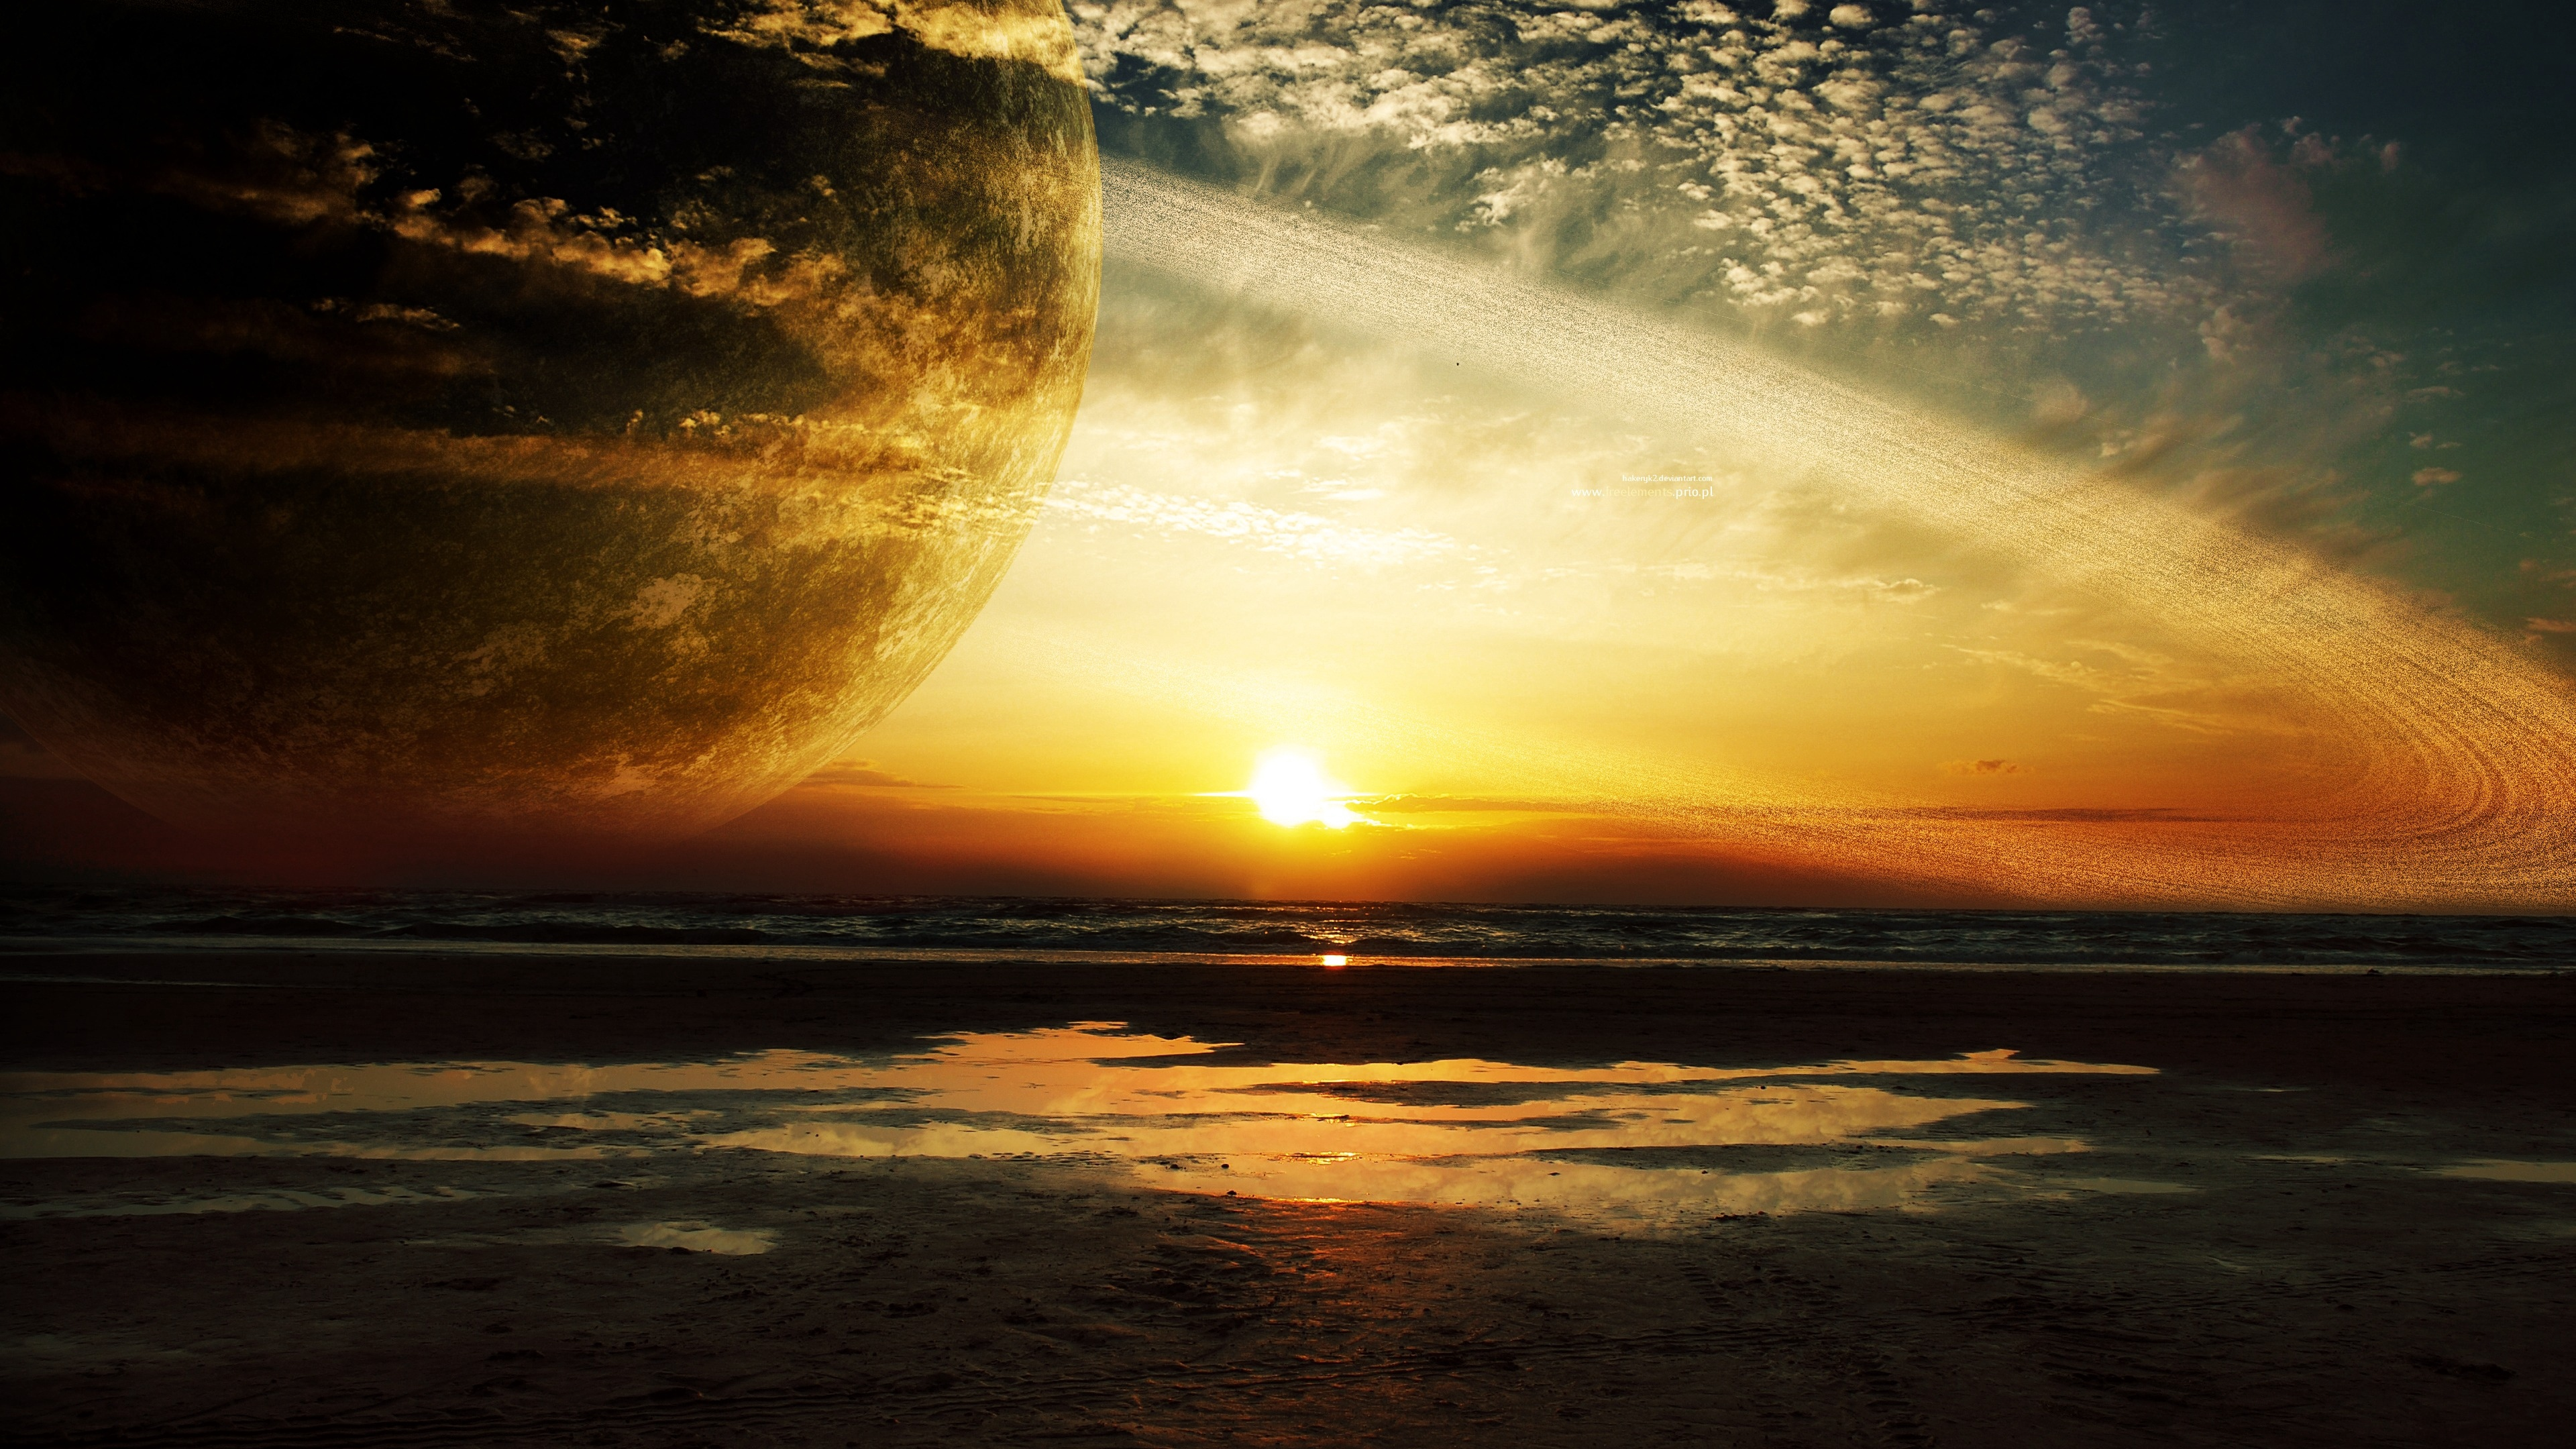 sunset sea rings planet 4k 1536017164 - sunset, sea, rings, planet 4k - sunset, Sea, Rings